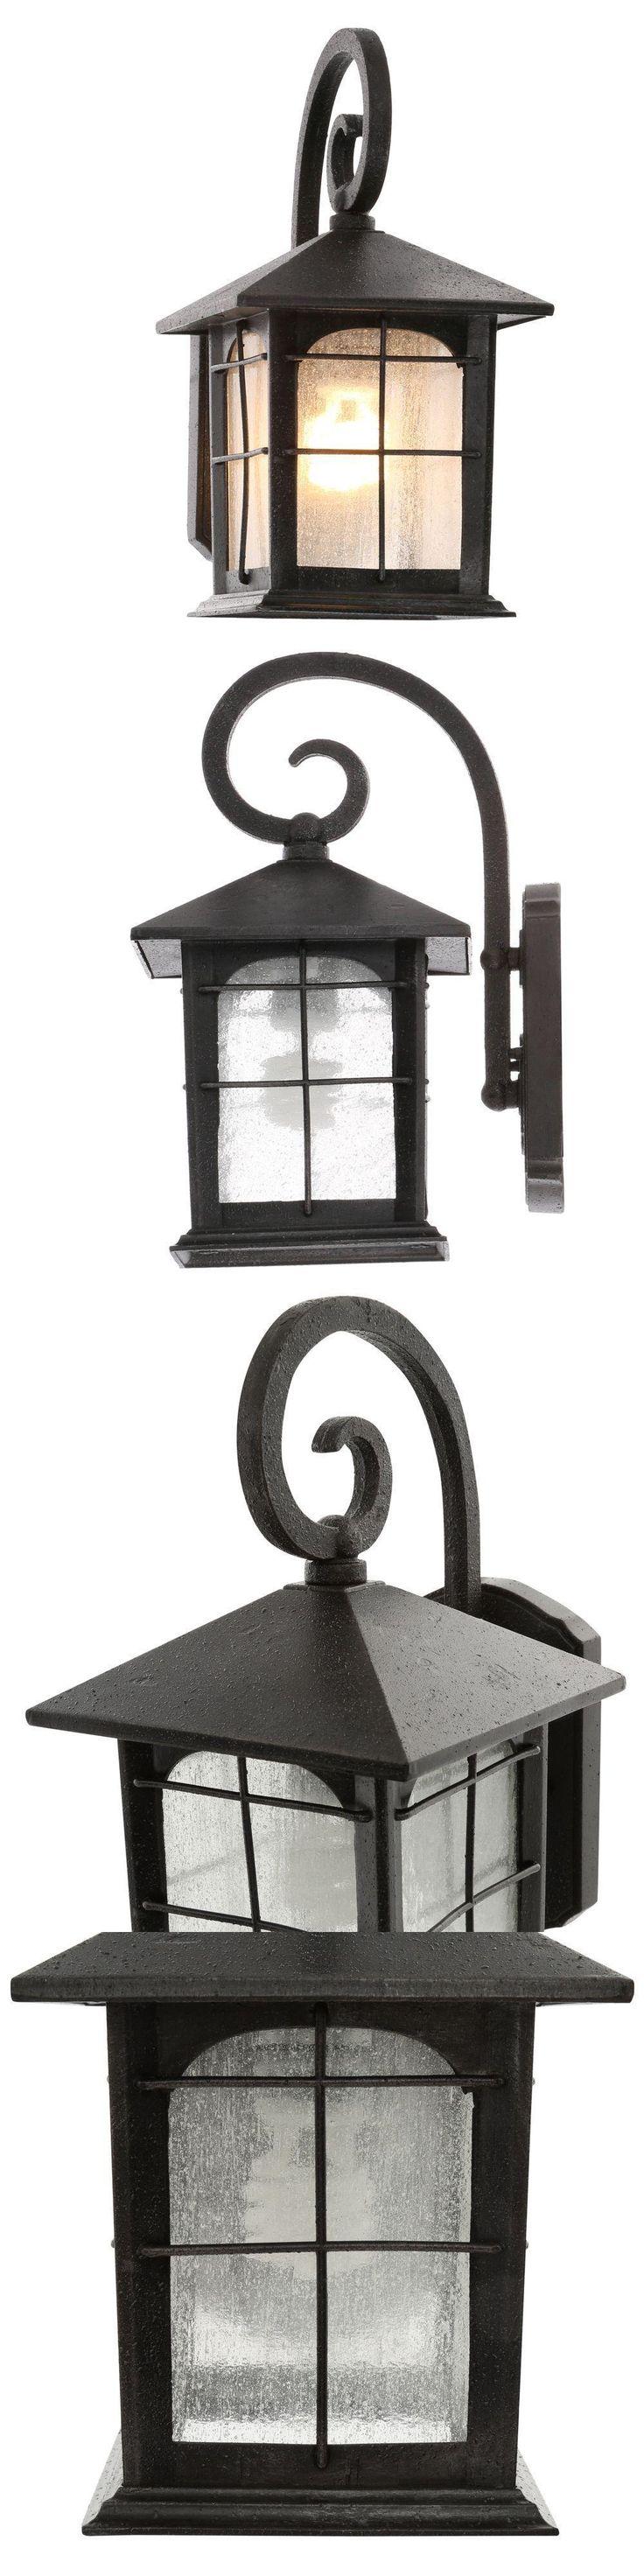 Outdoor Wall And Porch Lights 94939: 1 Light Outdoor Wall Lantern Light  Fixture Aged